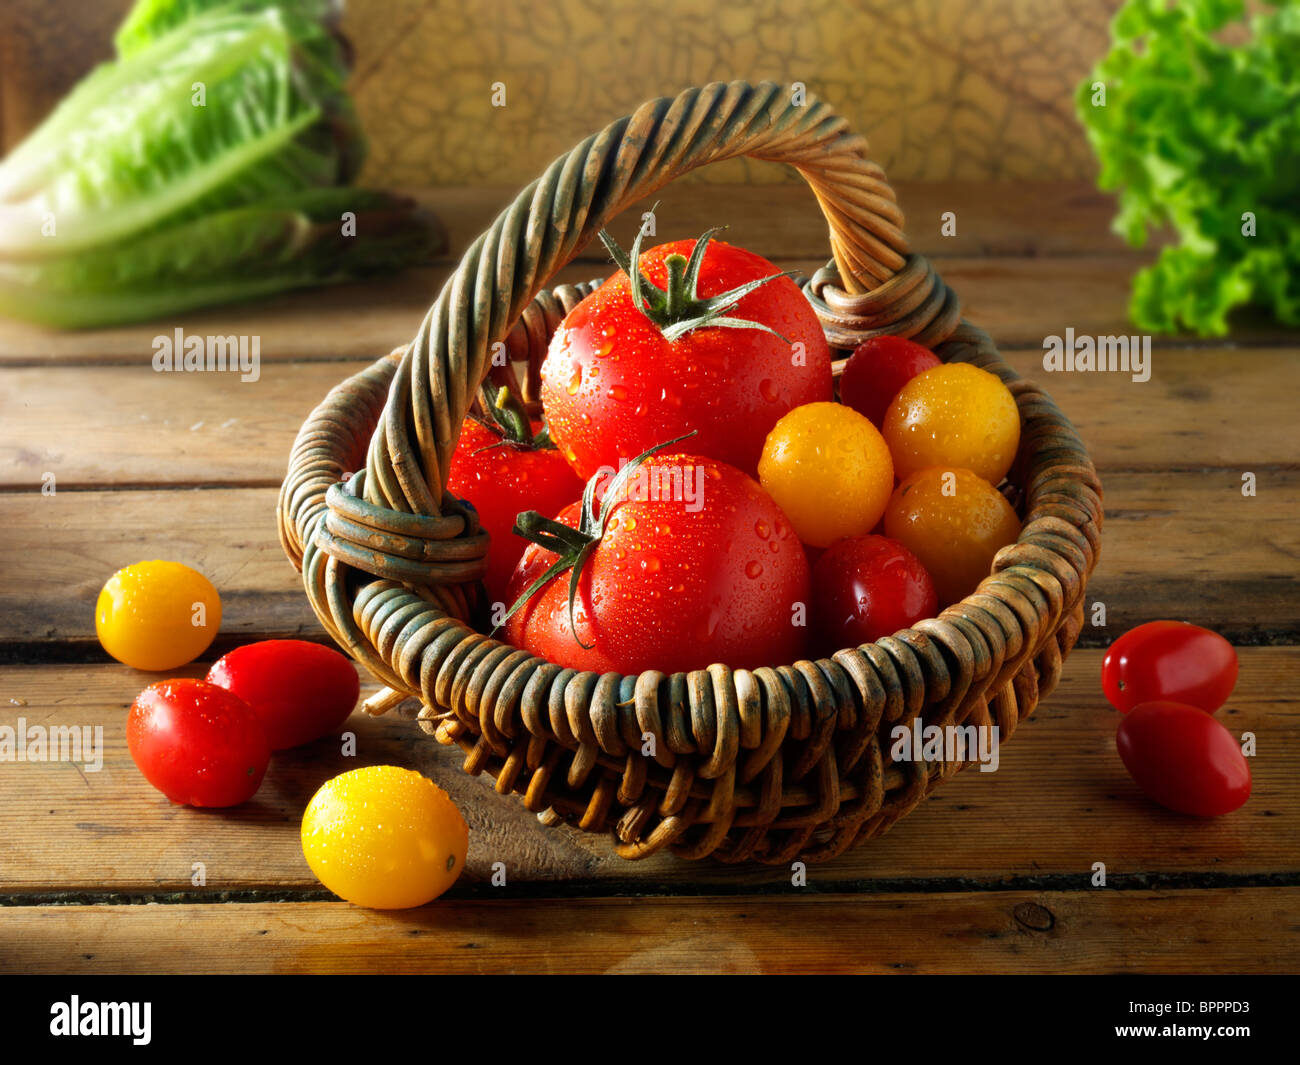 Mezcla los tomates, fotos, dibujos e imágenes Imagen De Stock